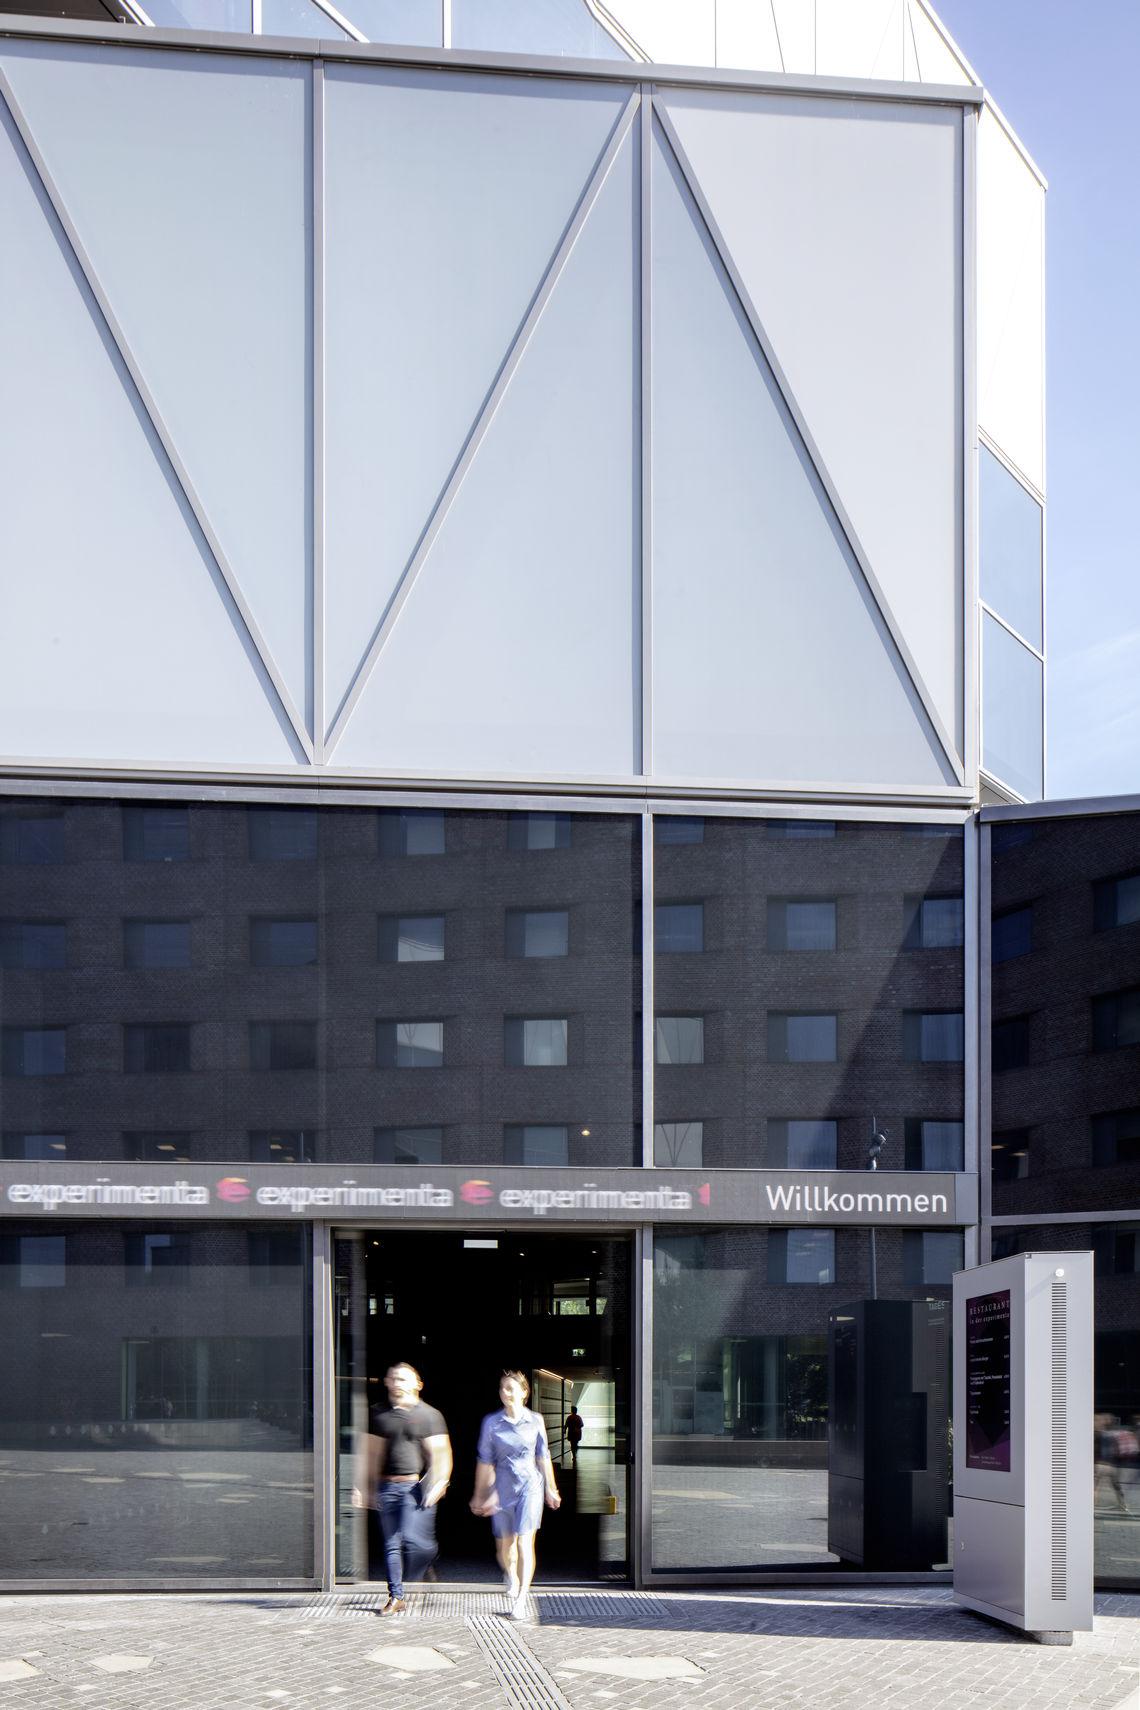 Des - سیستم های درب کشویی اتوماتیک در معماری تماشایی